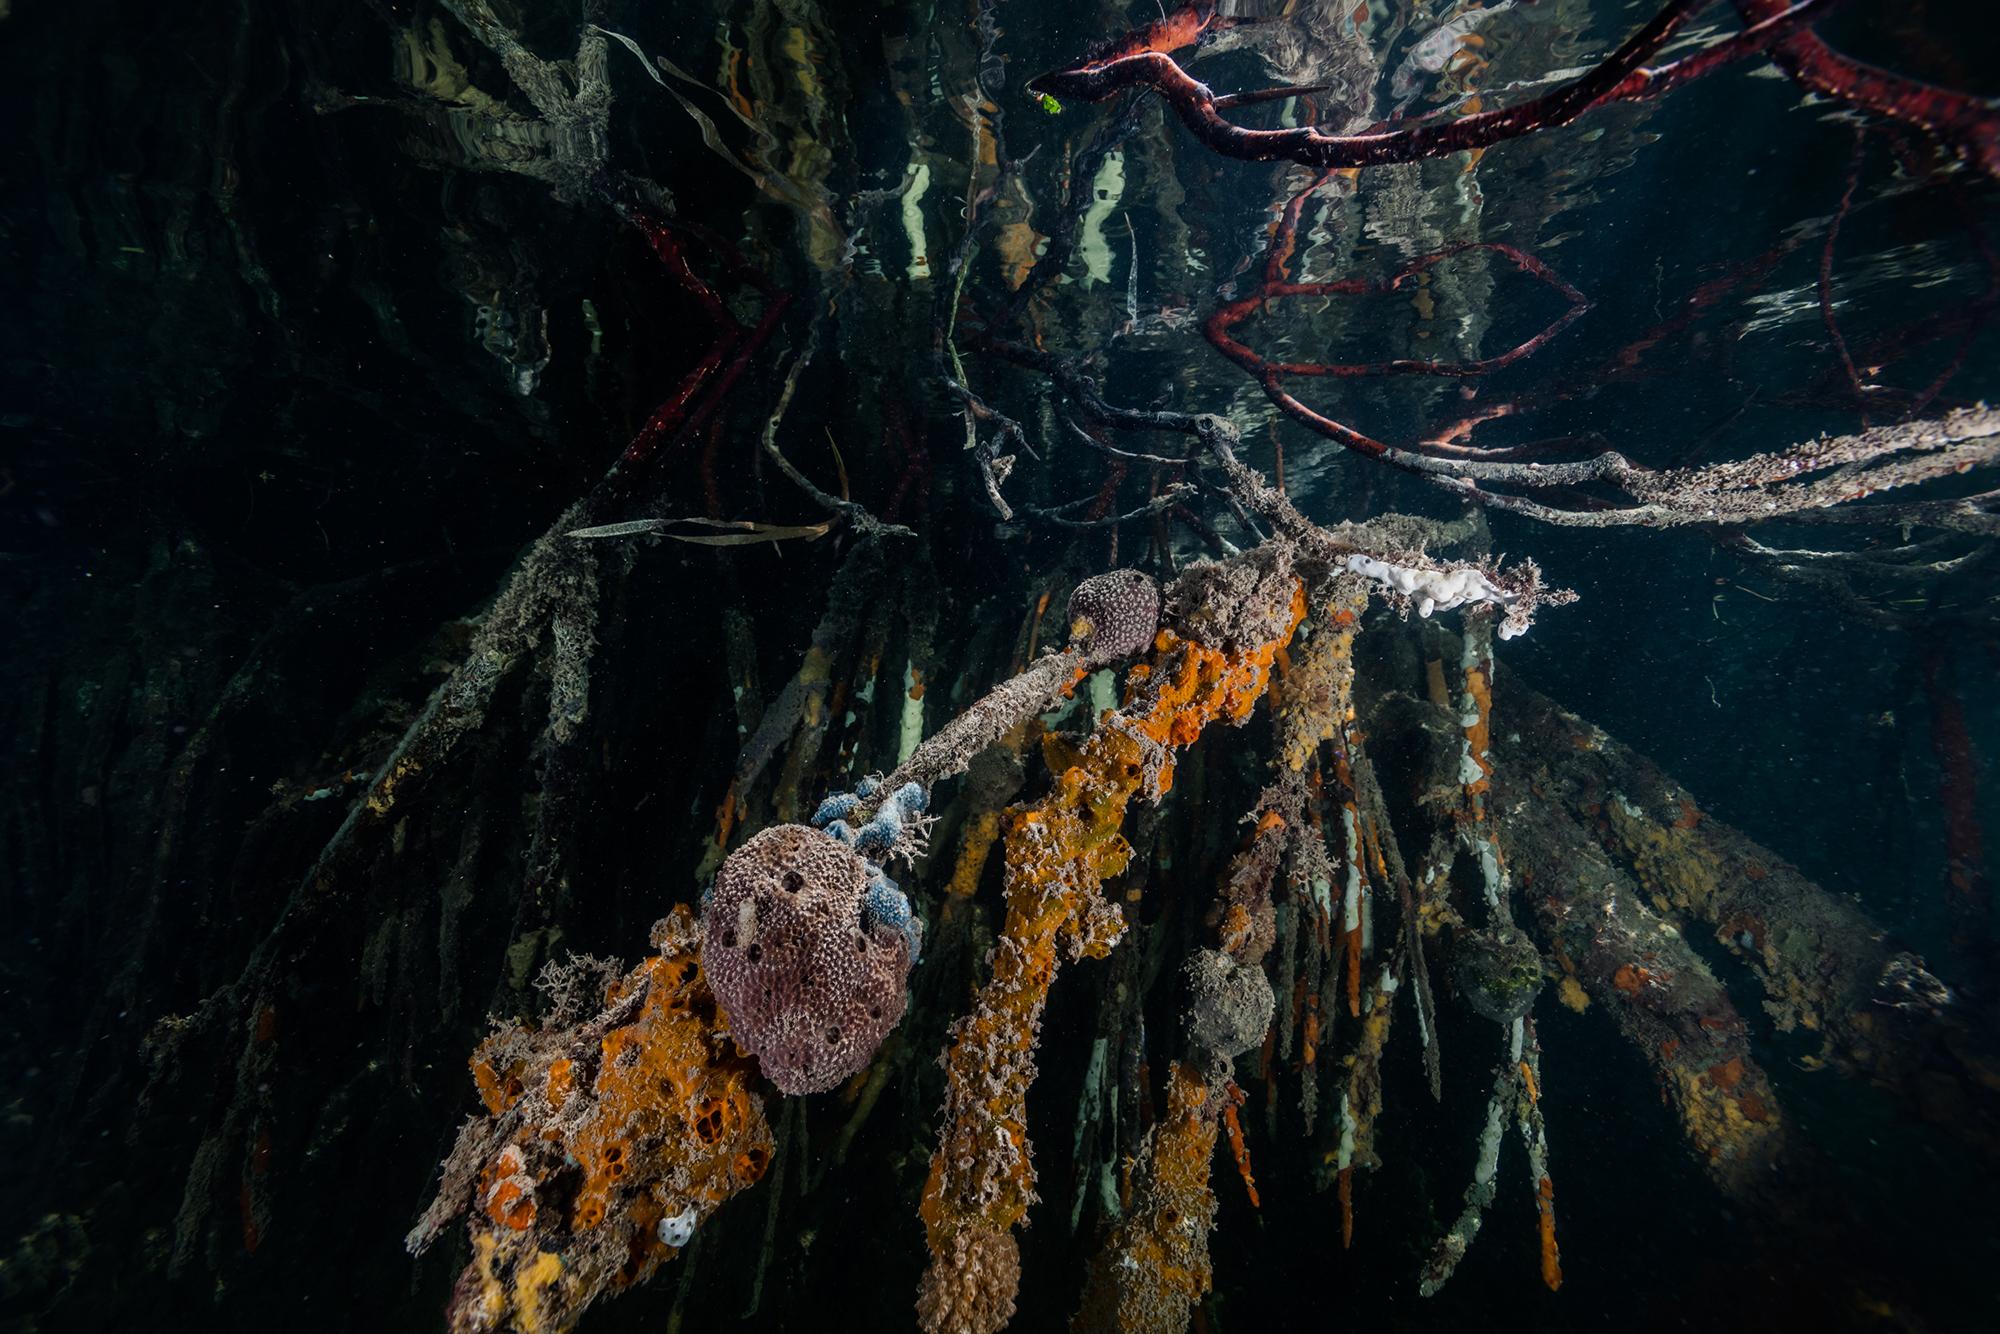 The Ocean Agency, Mangrove, Ocean Image Bank, mangrove, underwater, philip hamilton